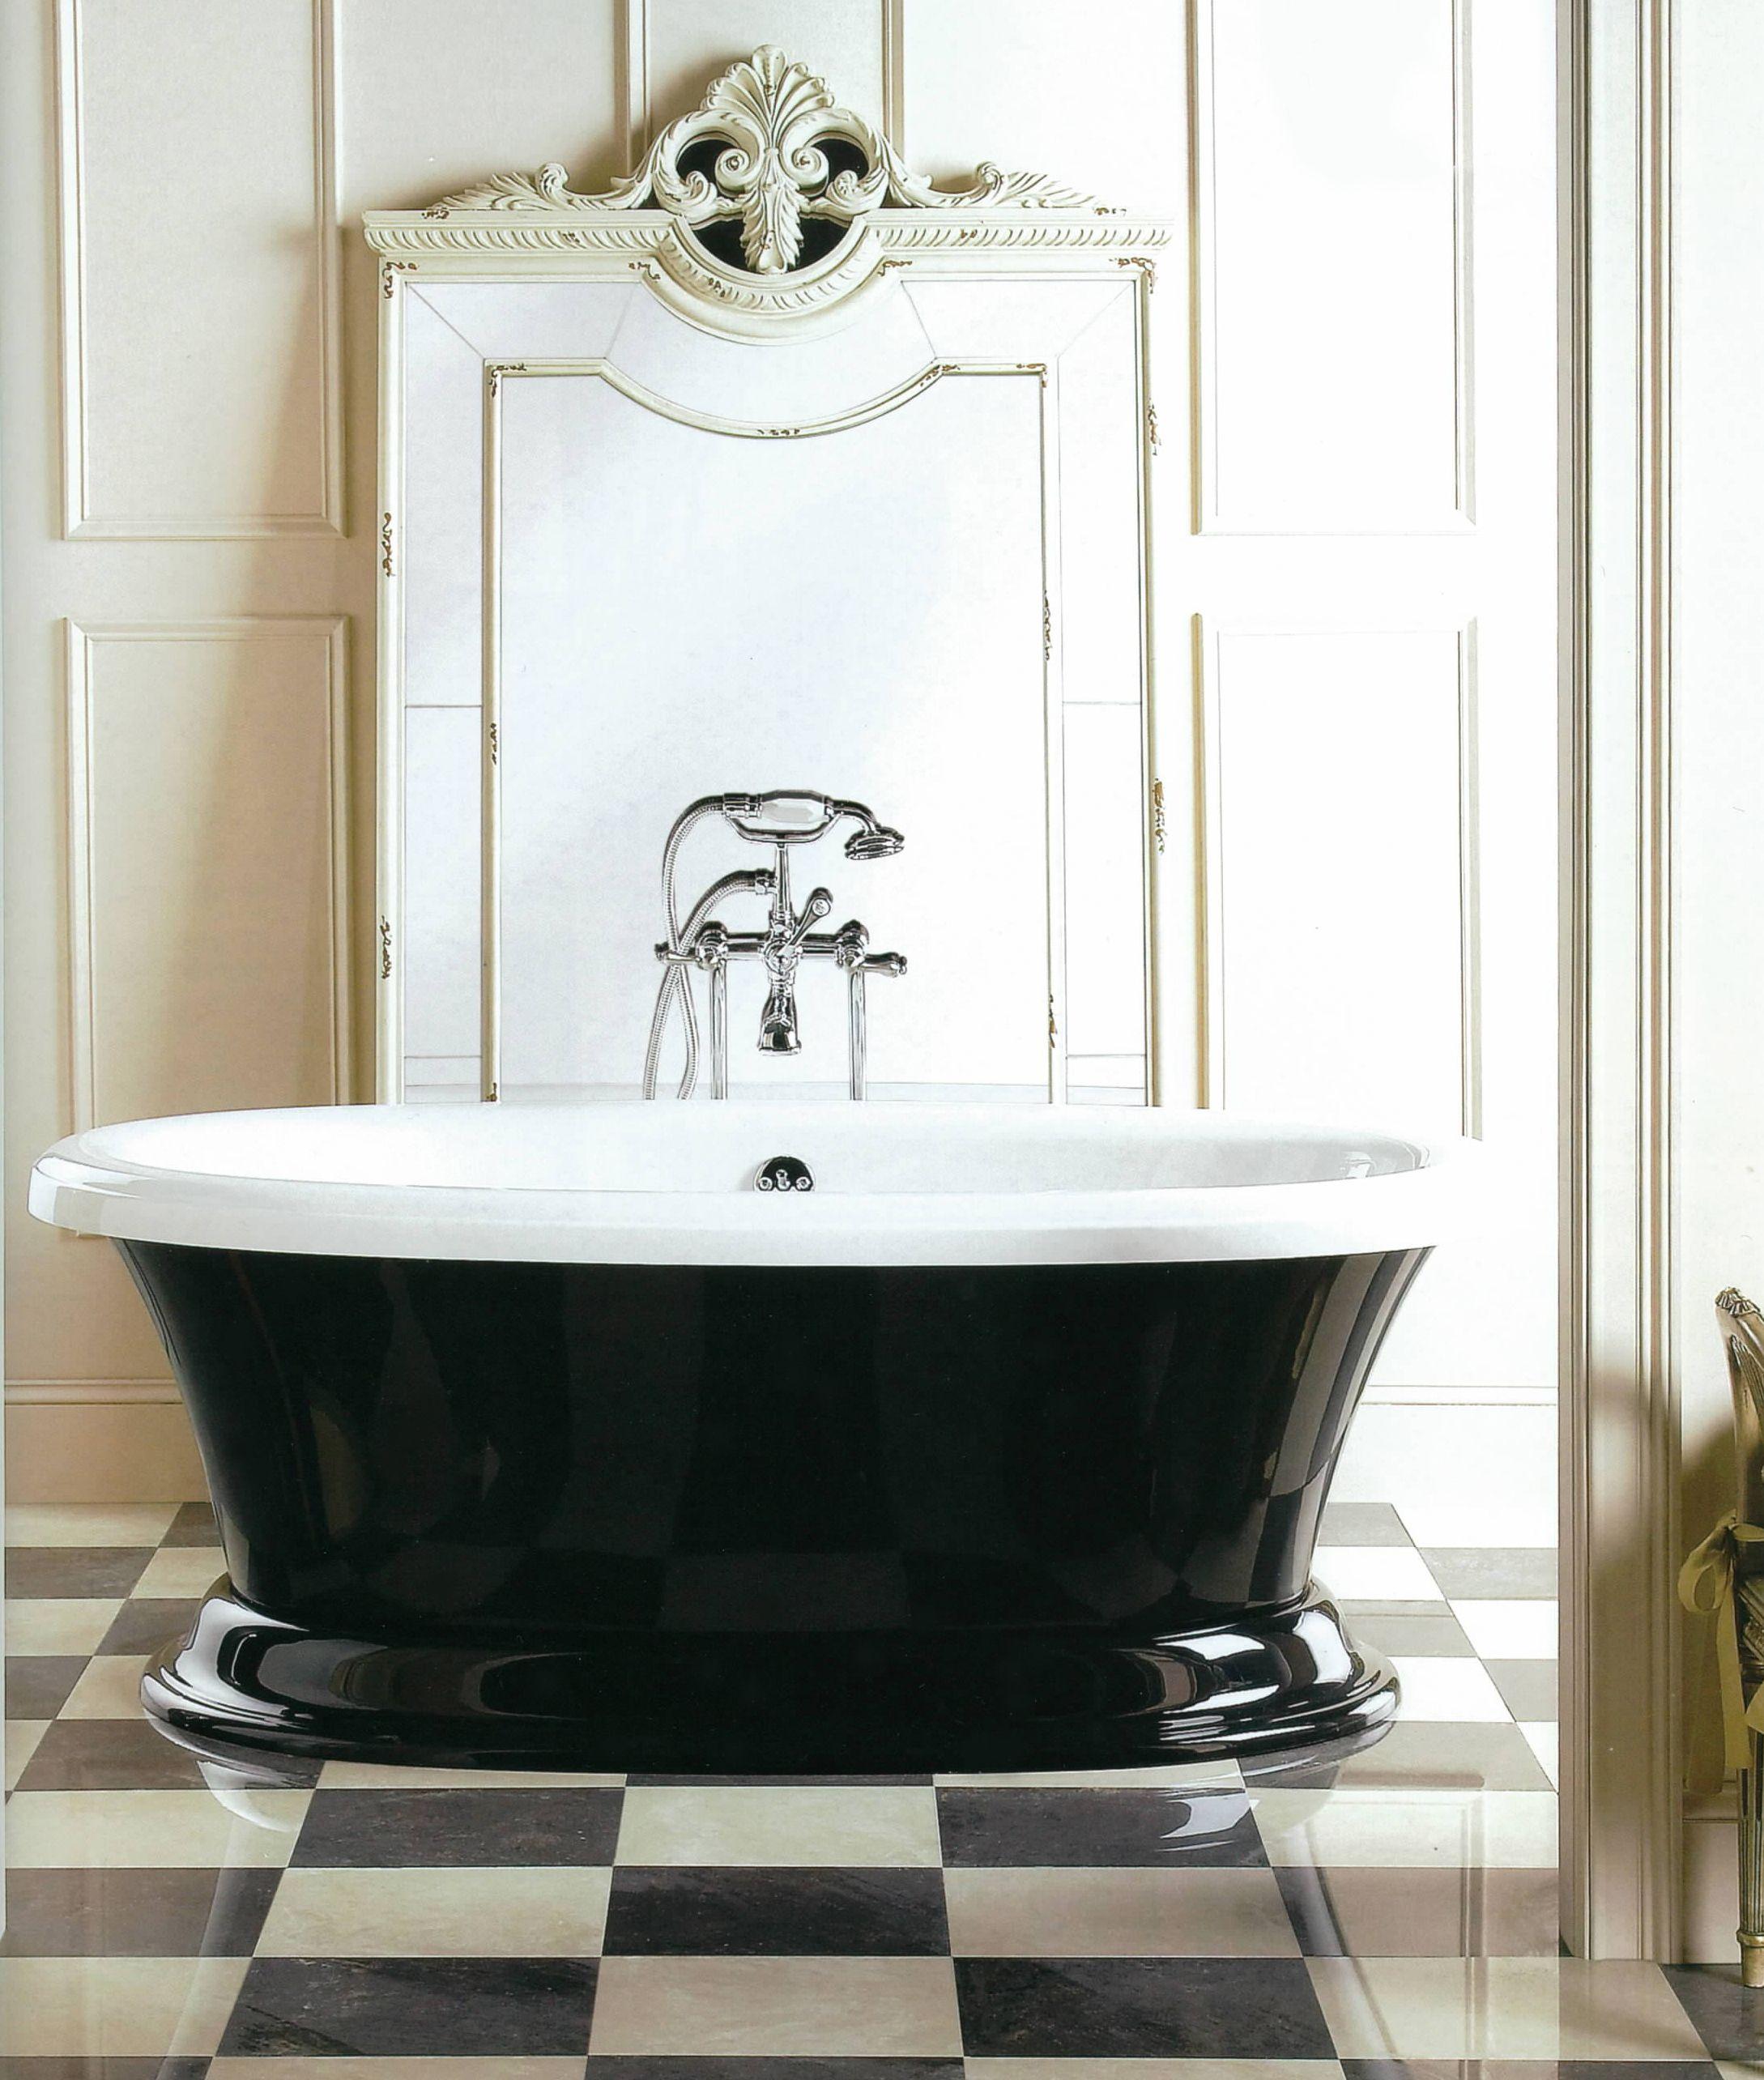 Black and white bathroom ideas pinterest - Aquatic Serenity 11 Freestanding Bath Tub Black And White Aquatic Black White Marble